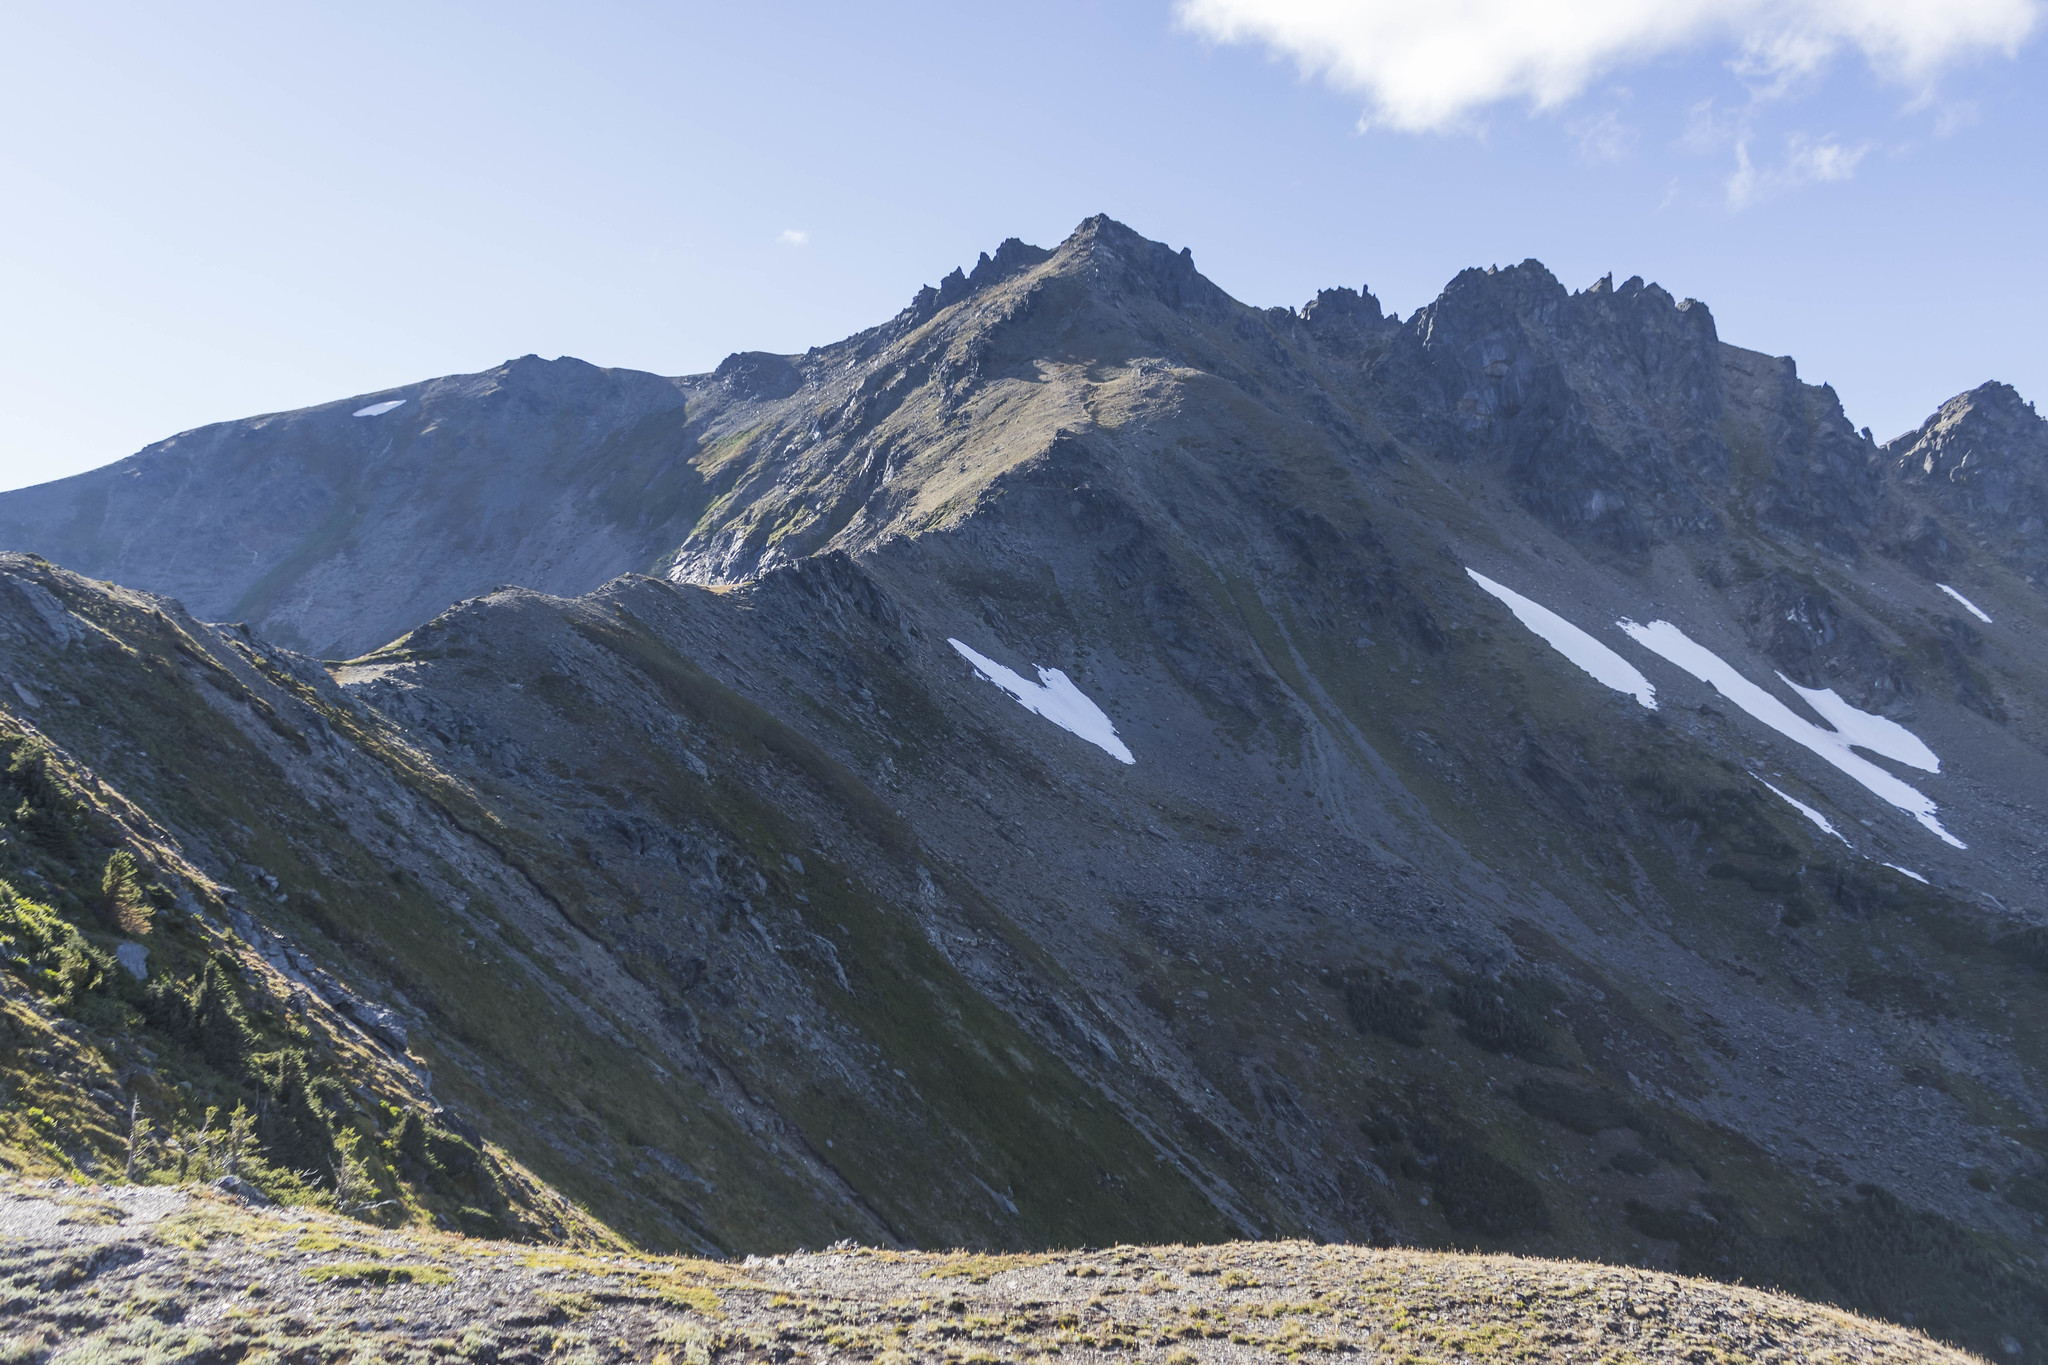 Next stop, Ladies Peak